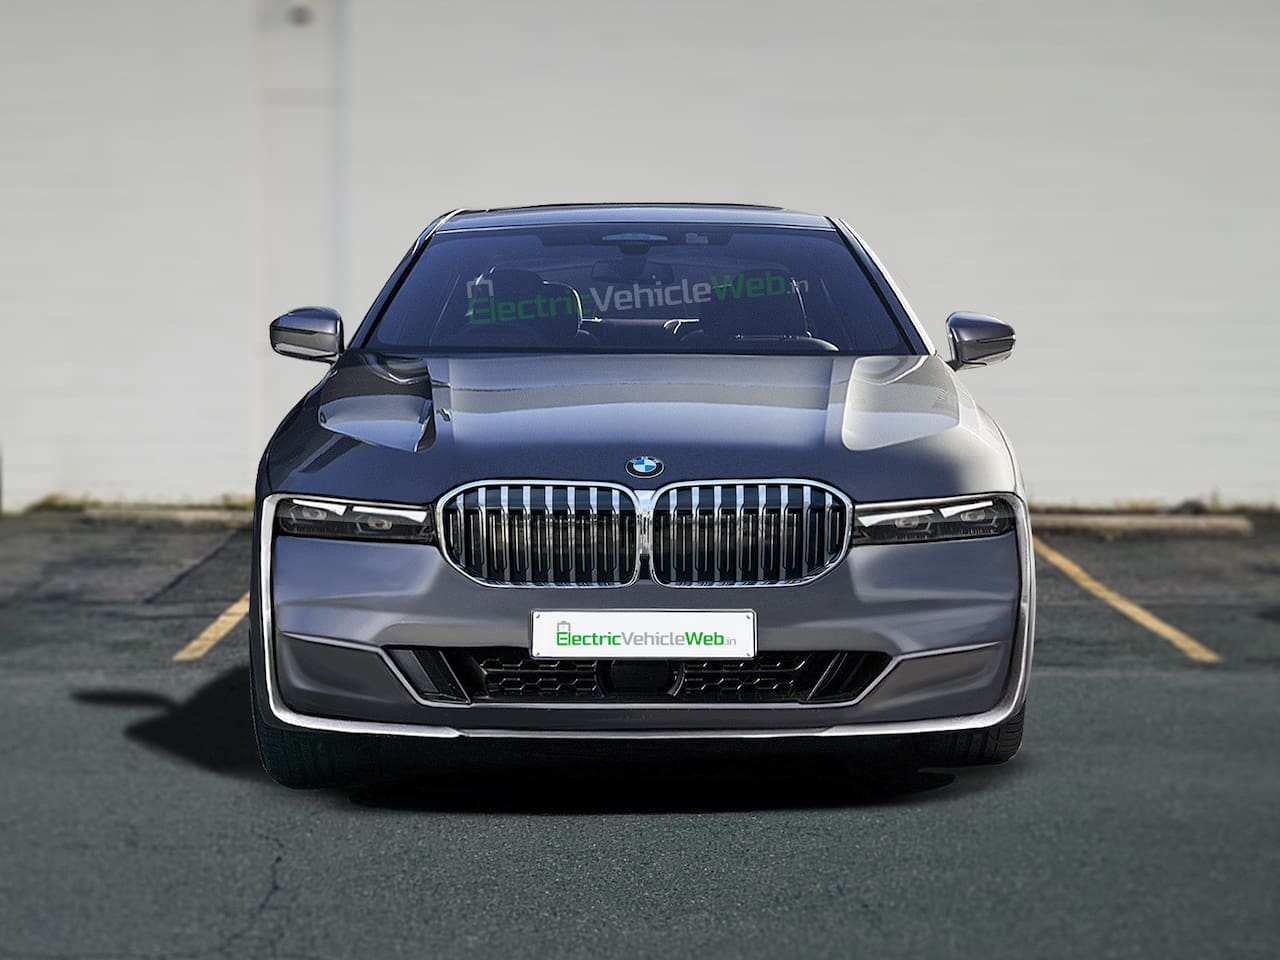 2022 BMW 7 Series front rendering